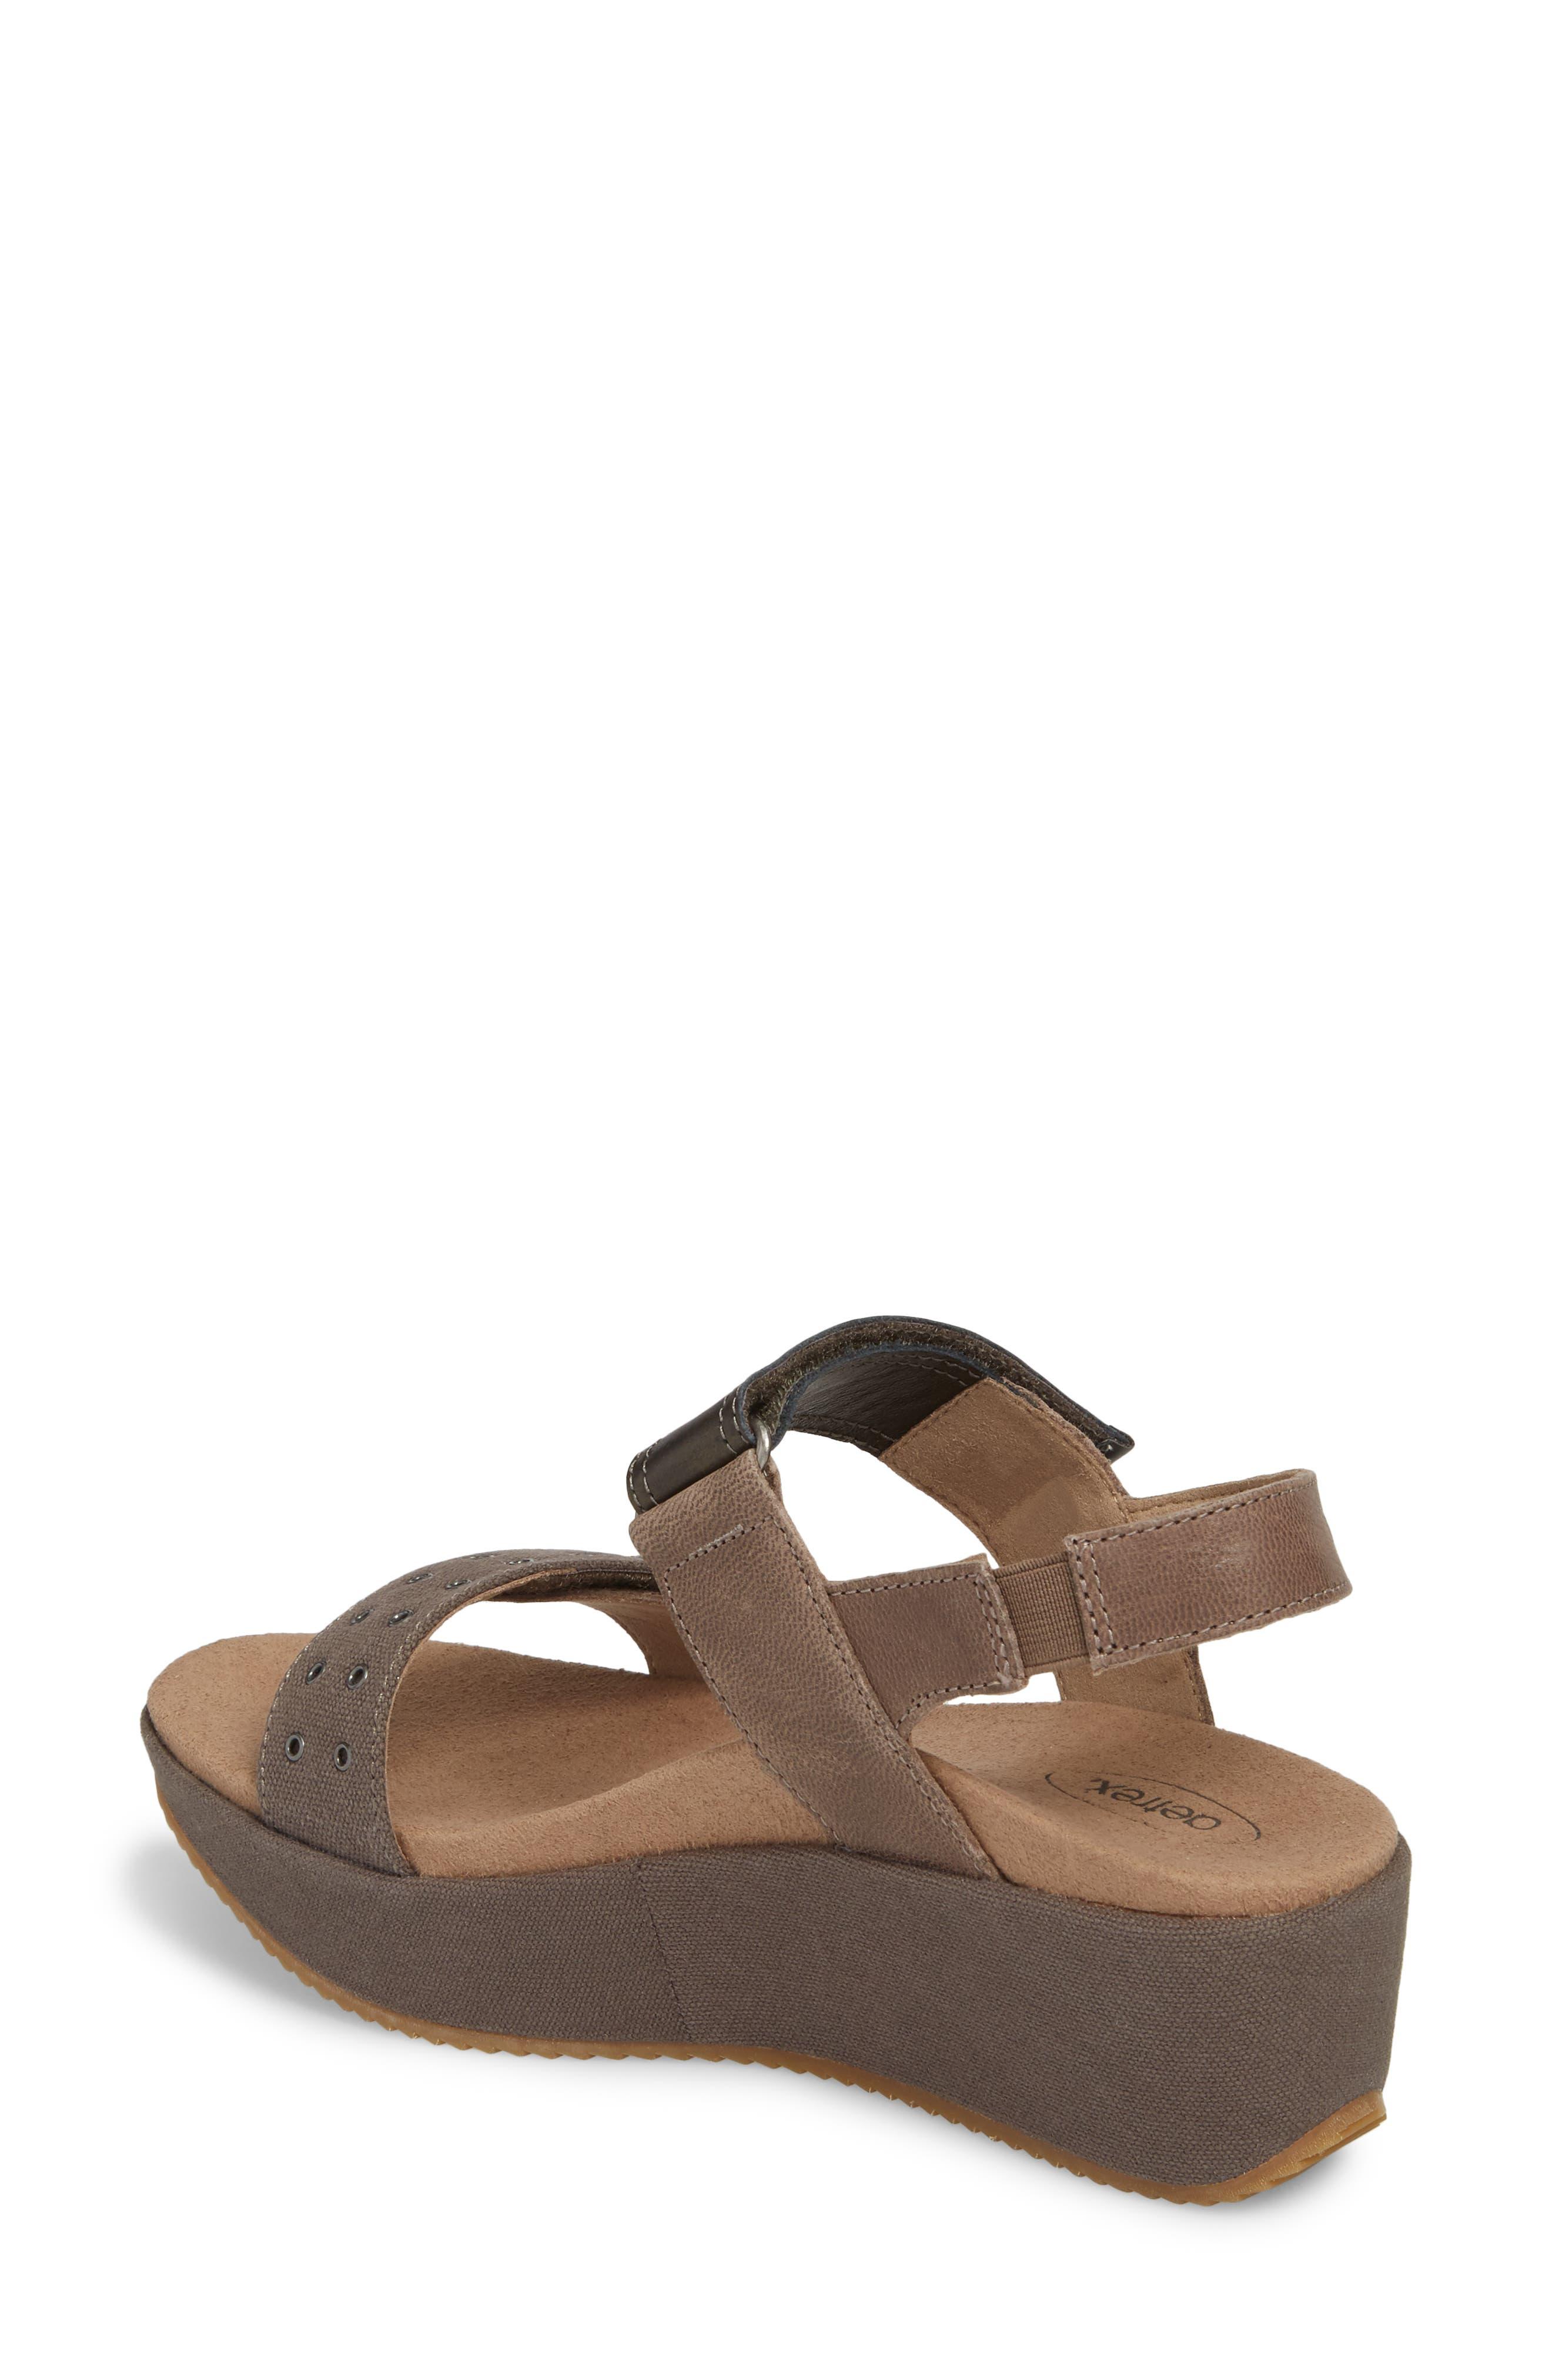 Tiffany Wedge Sandal,                             Alternate thumbnail 2, color,                             Stone Leather